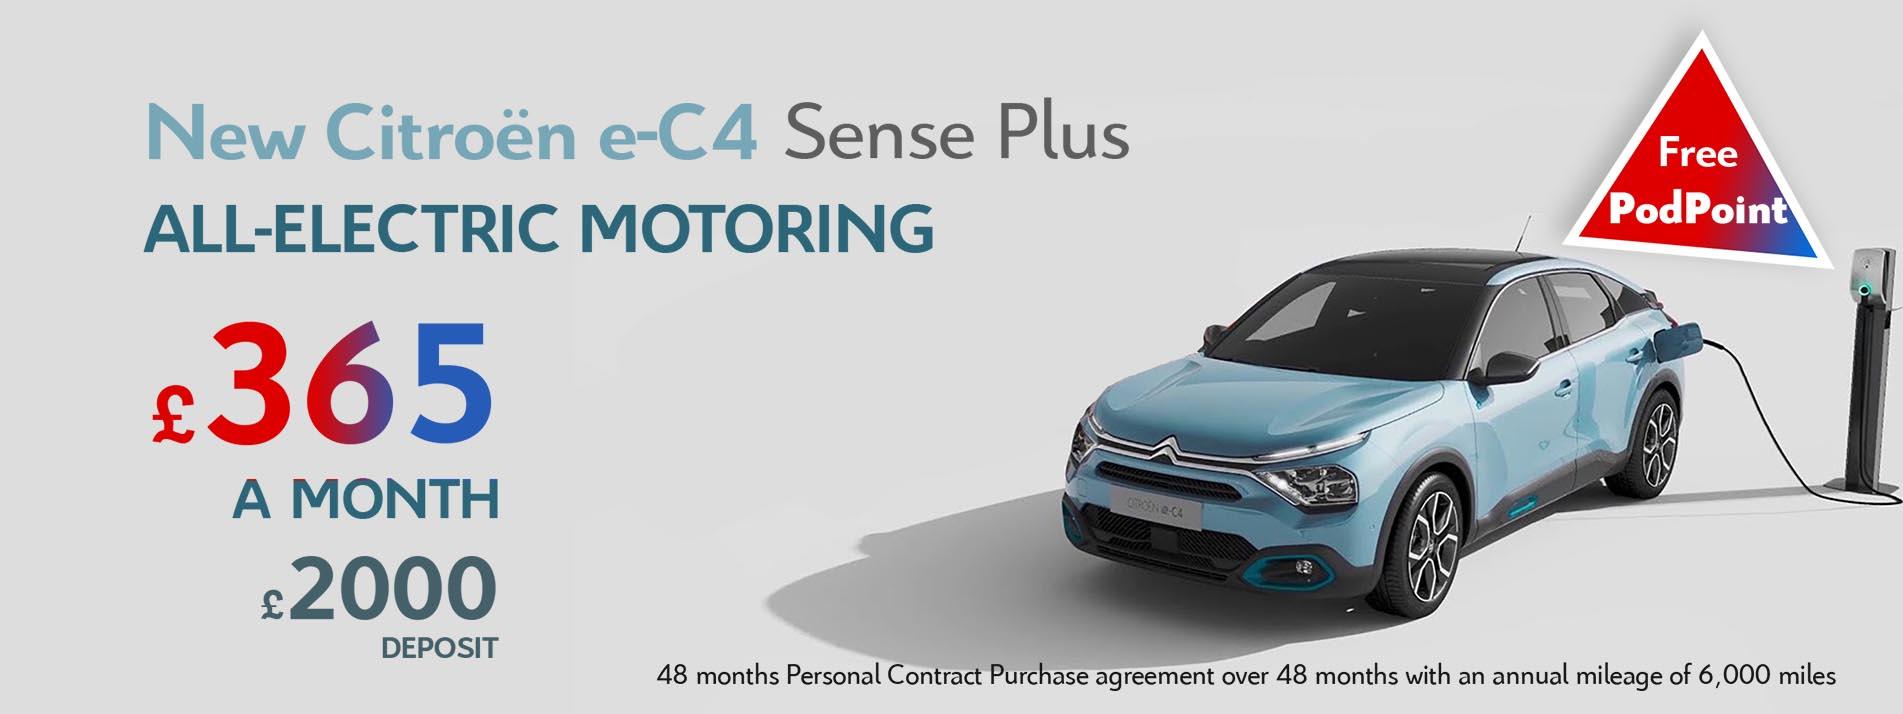 new-citroen-all-electric-e-c4-sense-plus-pcp-offer-m-sli